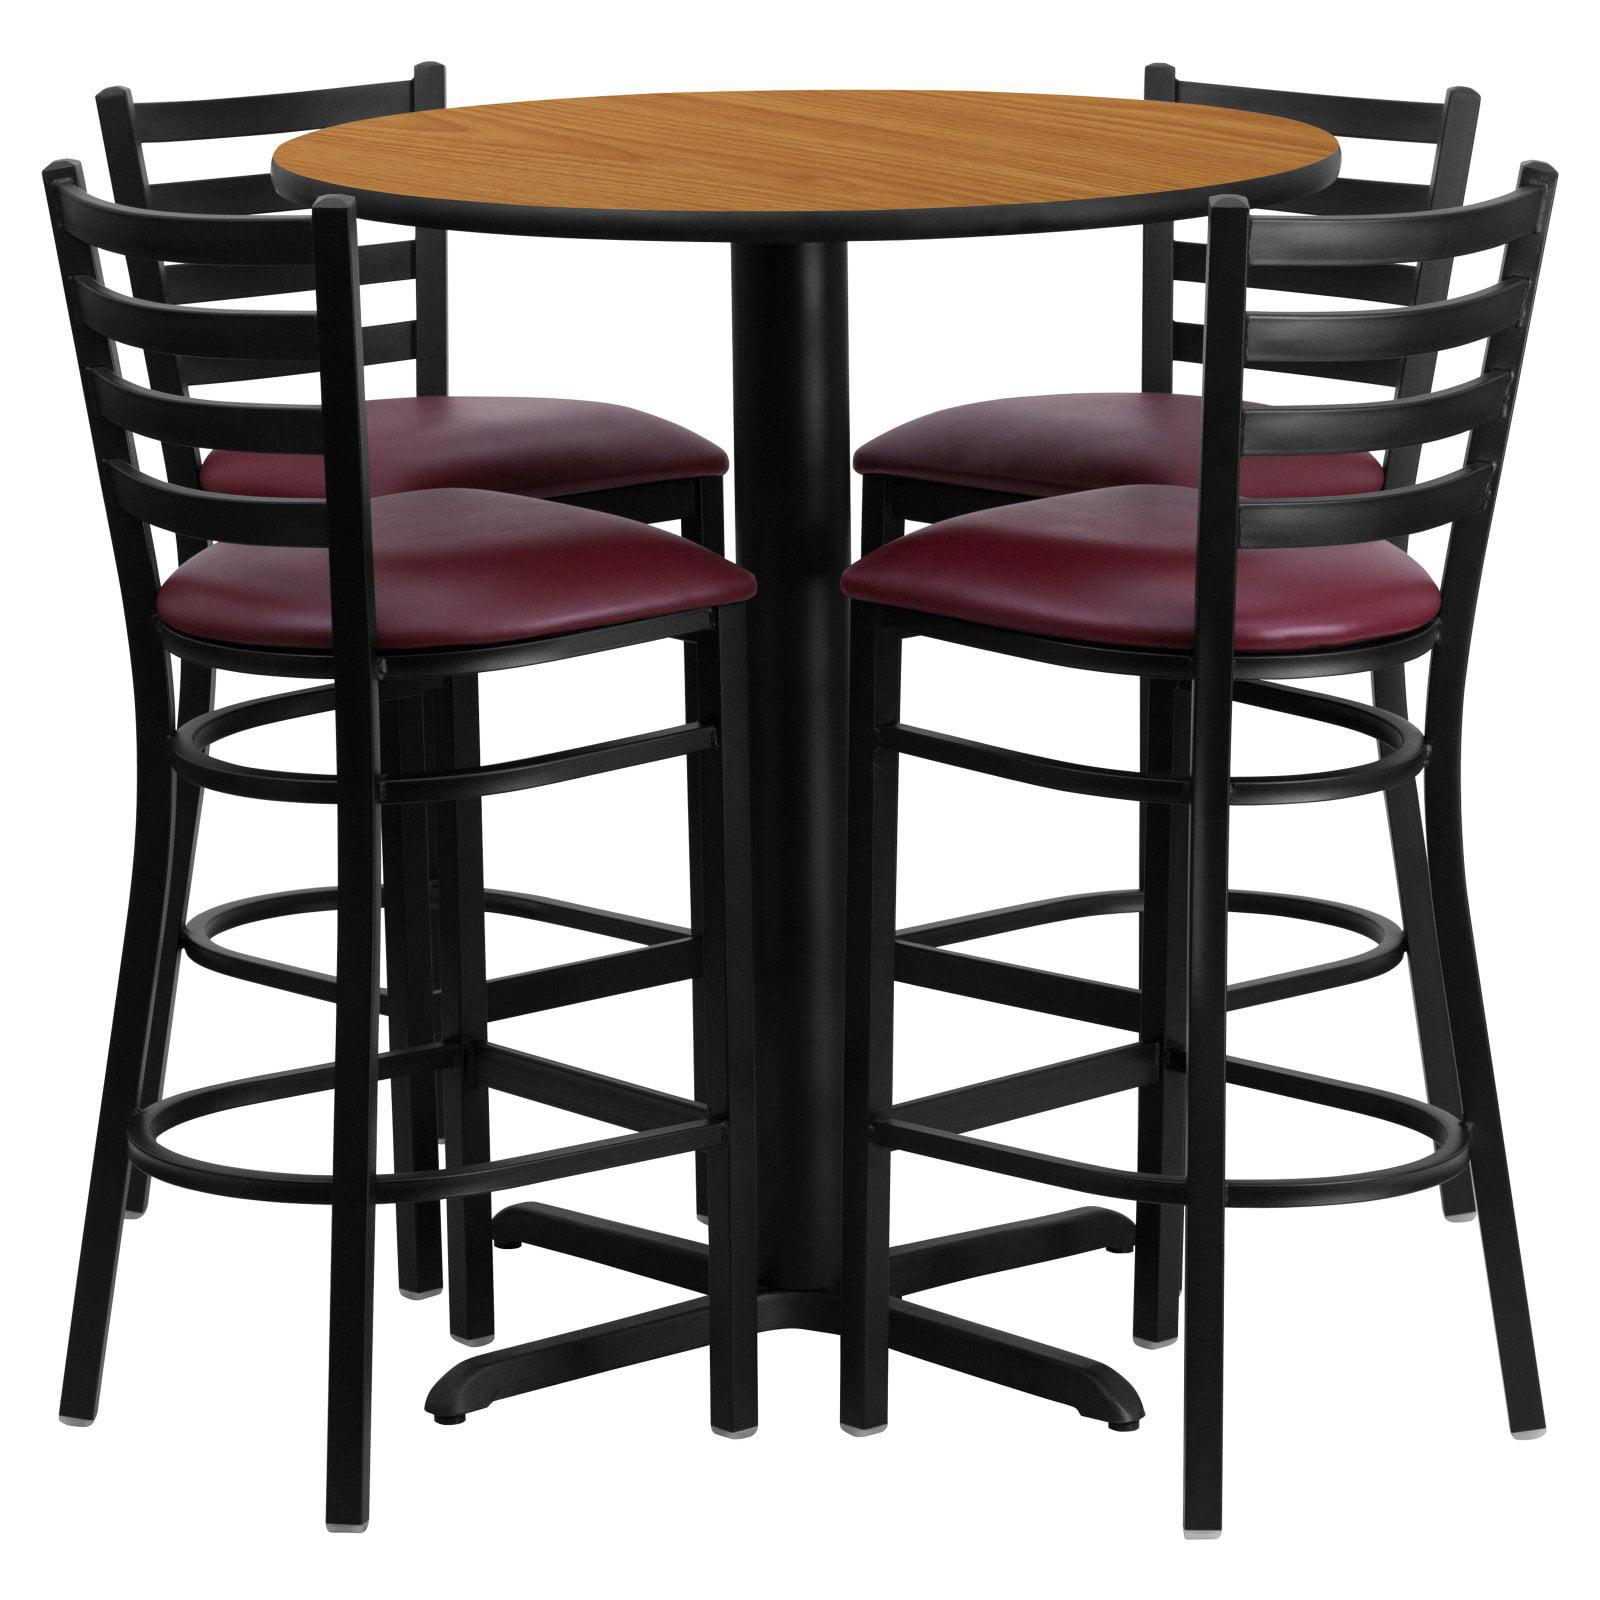 Flash Furniture 30'' Round Natural Laminate Table Set with 4 Ladder Back Metal Barstools, Burgundy Vinyl Seat Black, Burgundy, Natural